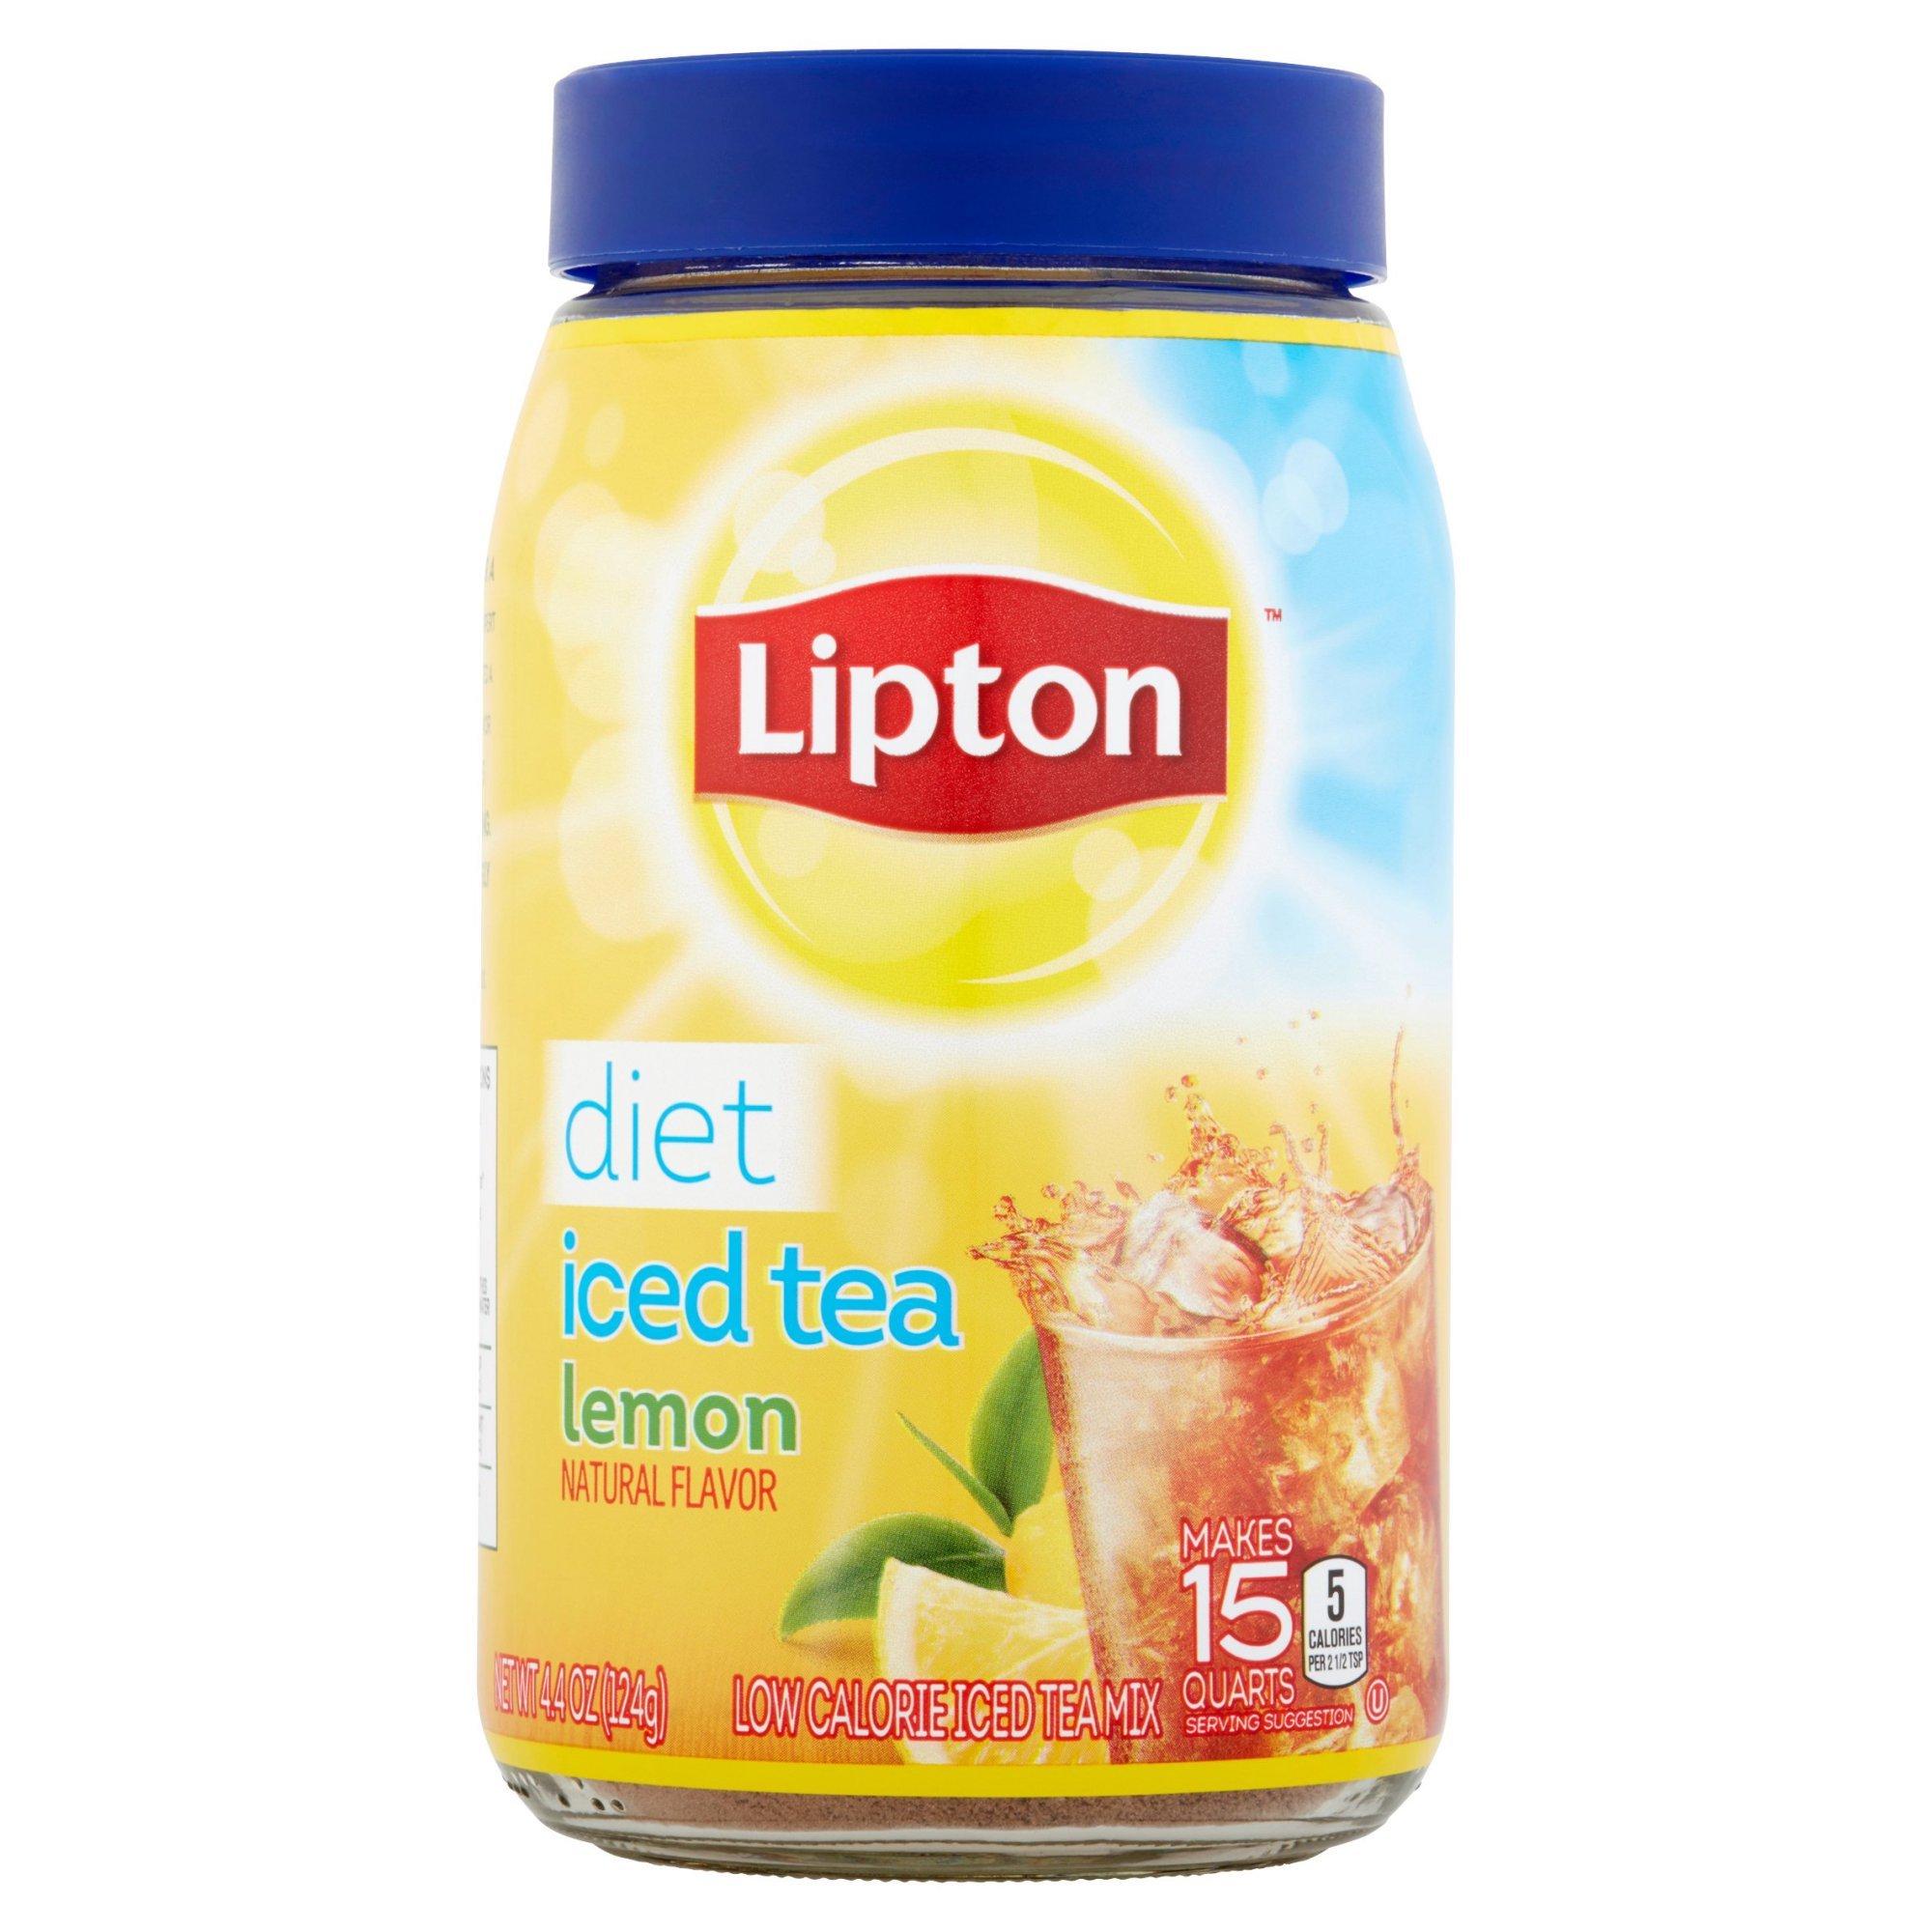 Lipton Iced Tea Mix Diet Lemon, 15 qt (Pack of 4)